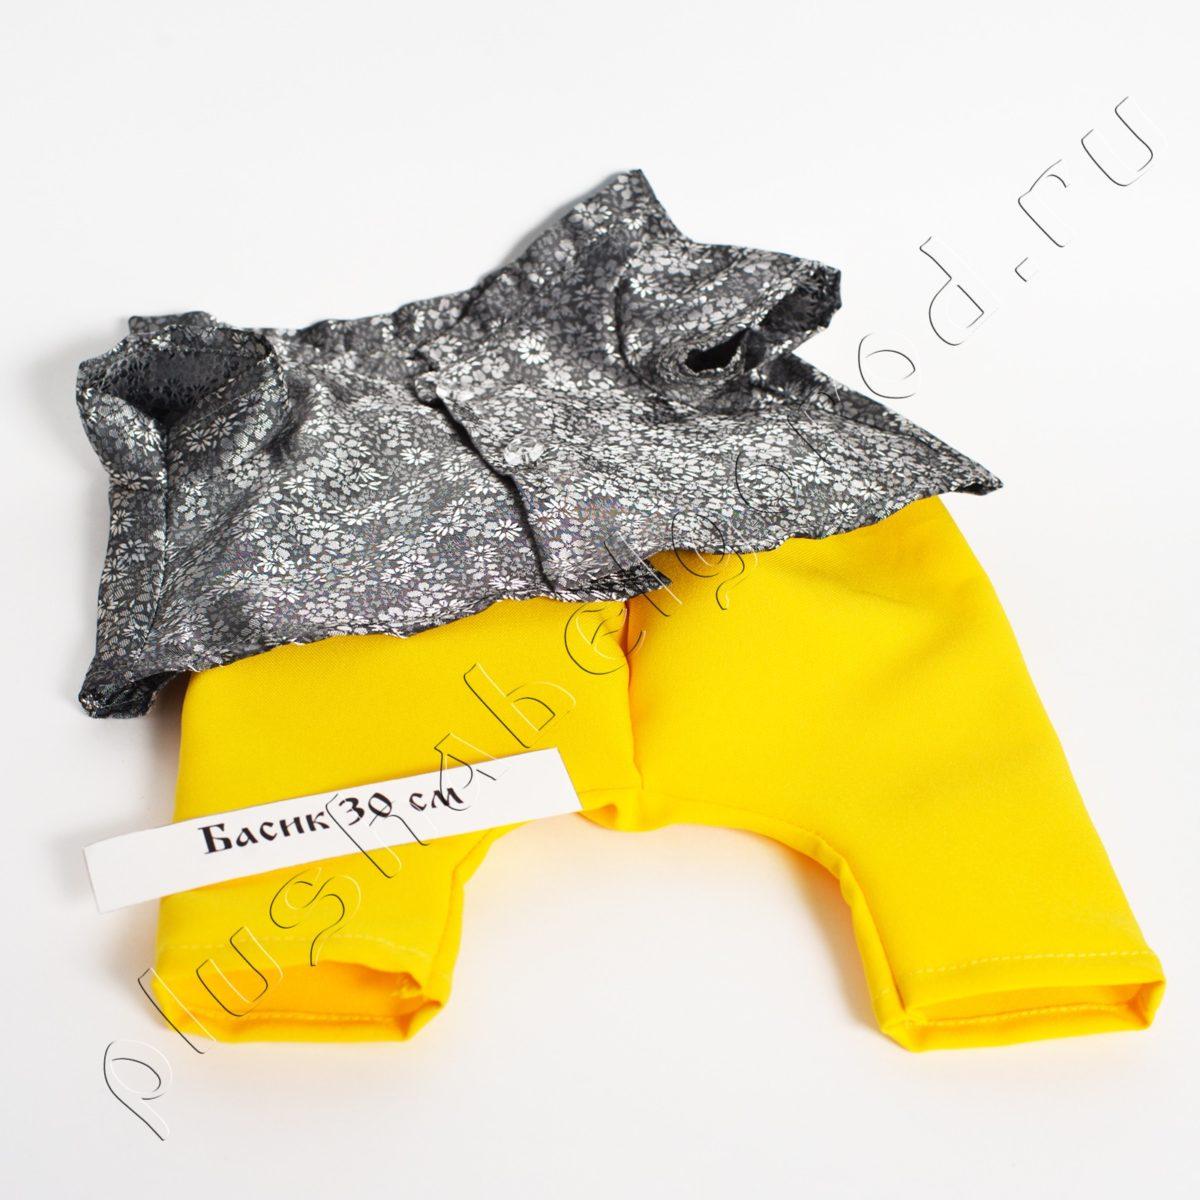 Акция! Вместо 600₽! Брюки желтые и рубашка